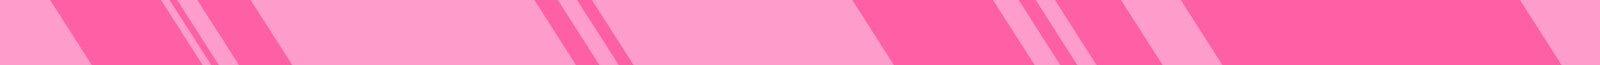 Rosa Band, internationales Symbol des Brustkrebsbewusstseins stock abbildung